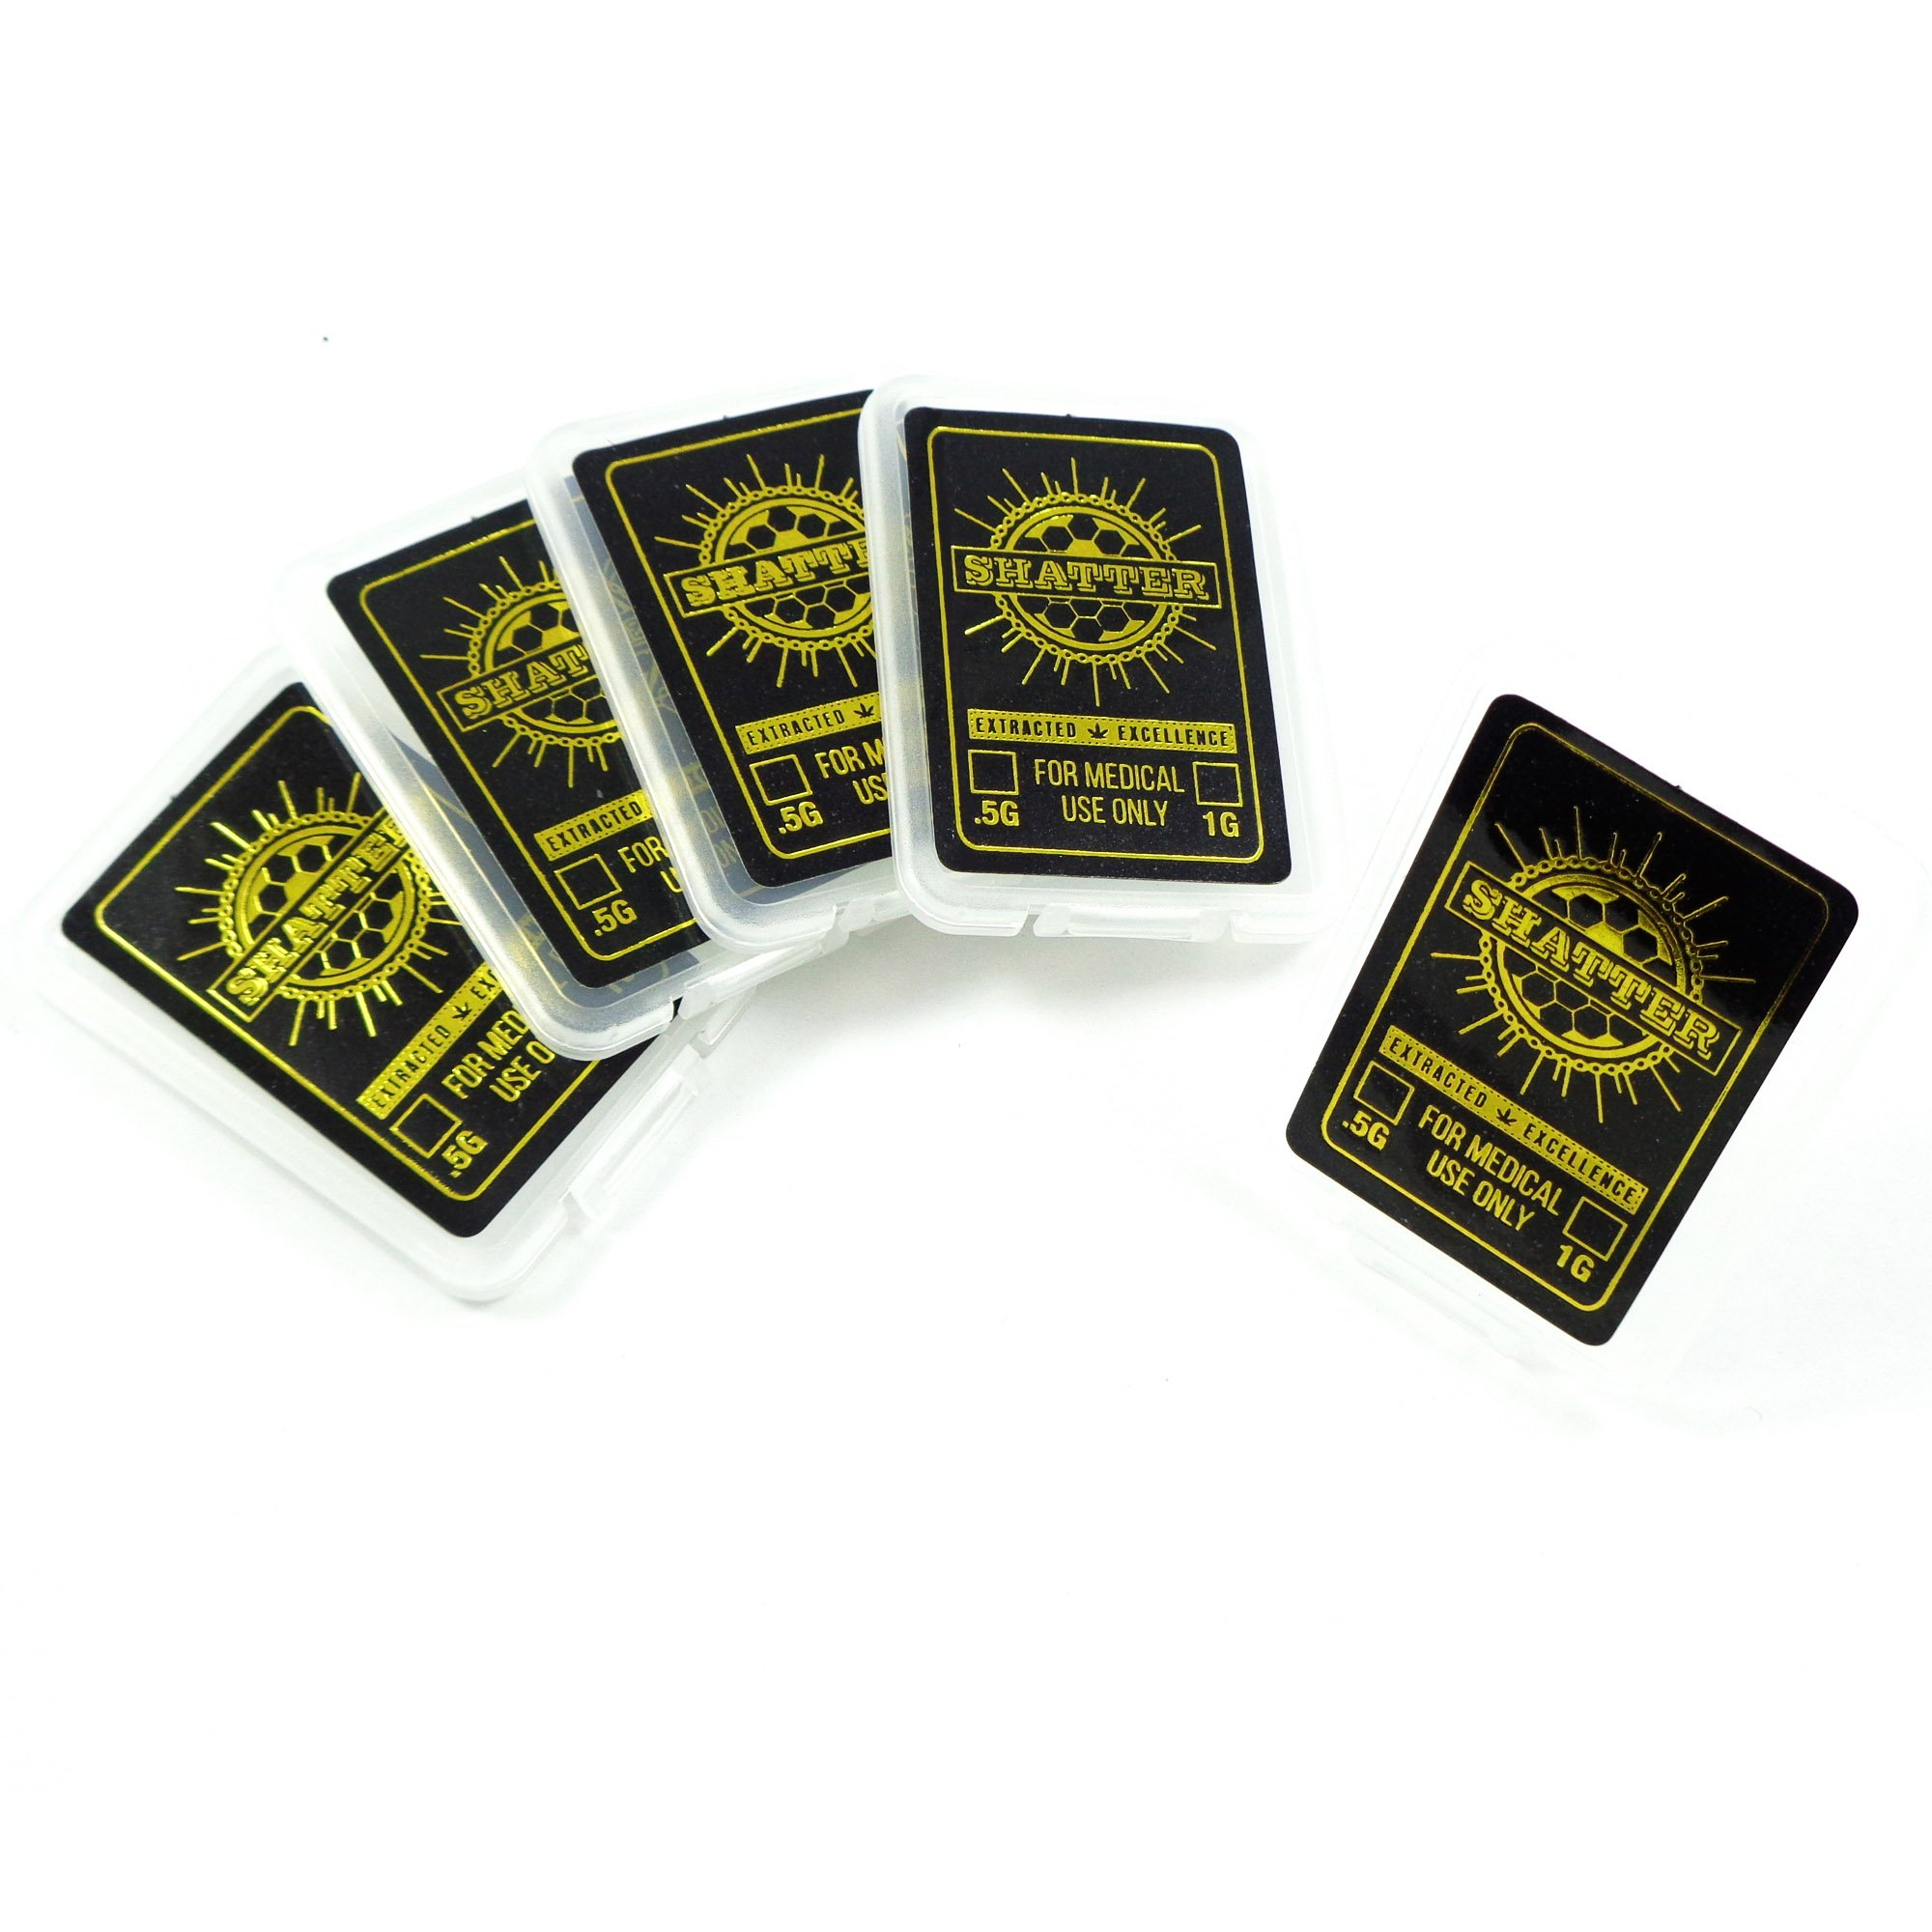 25 Black Gold Foil Shatter Packs Wax Oil SD Card MMJ Packaging by Shatter Labels SP-003